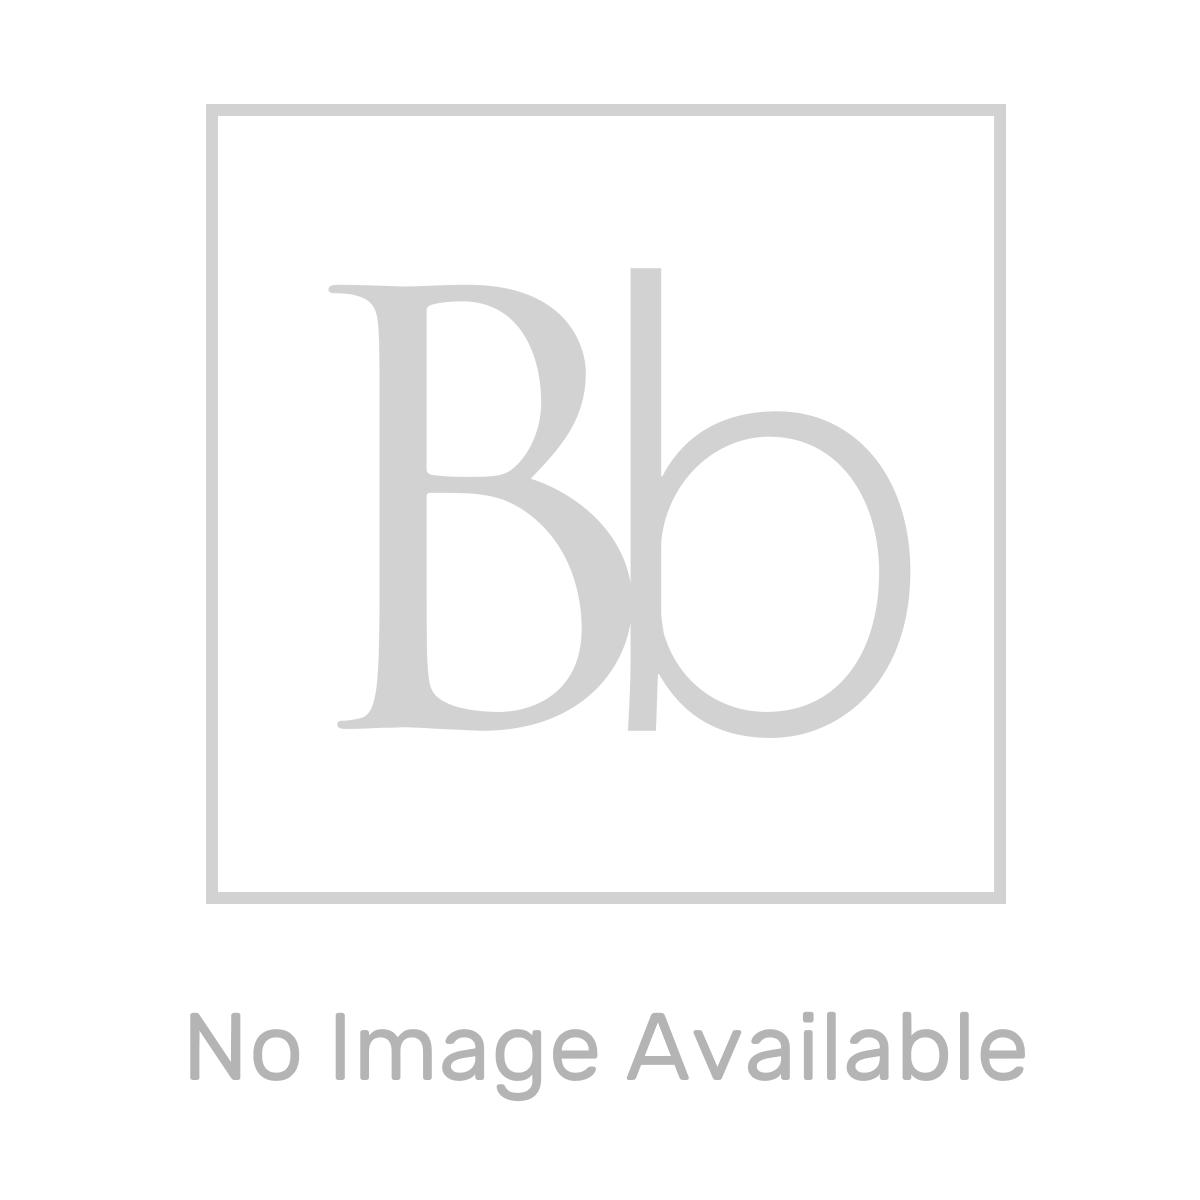 Merlyn Series 8 In-Fold Shower Door with Inline Panel